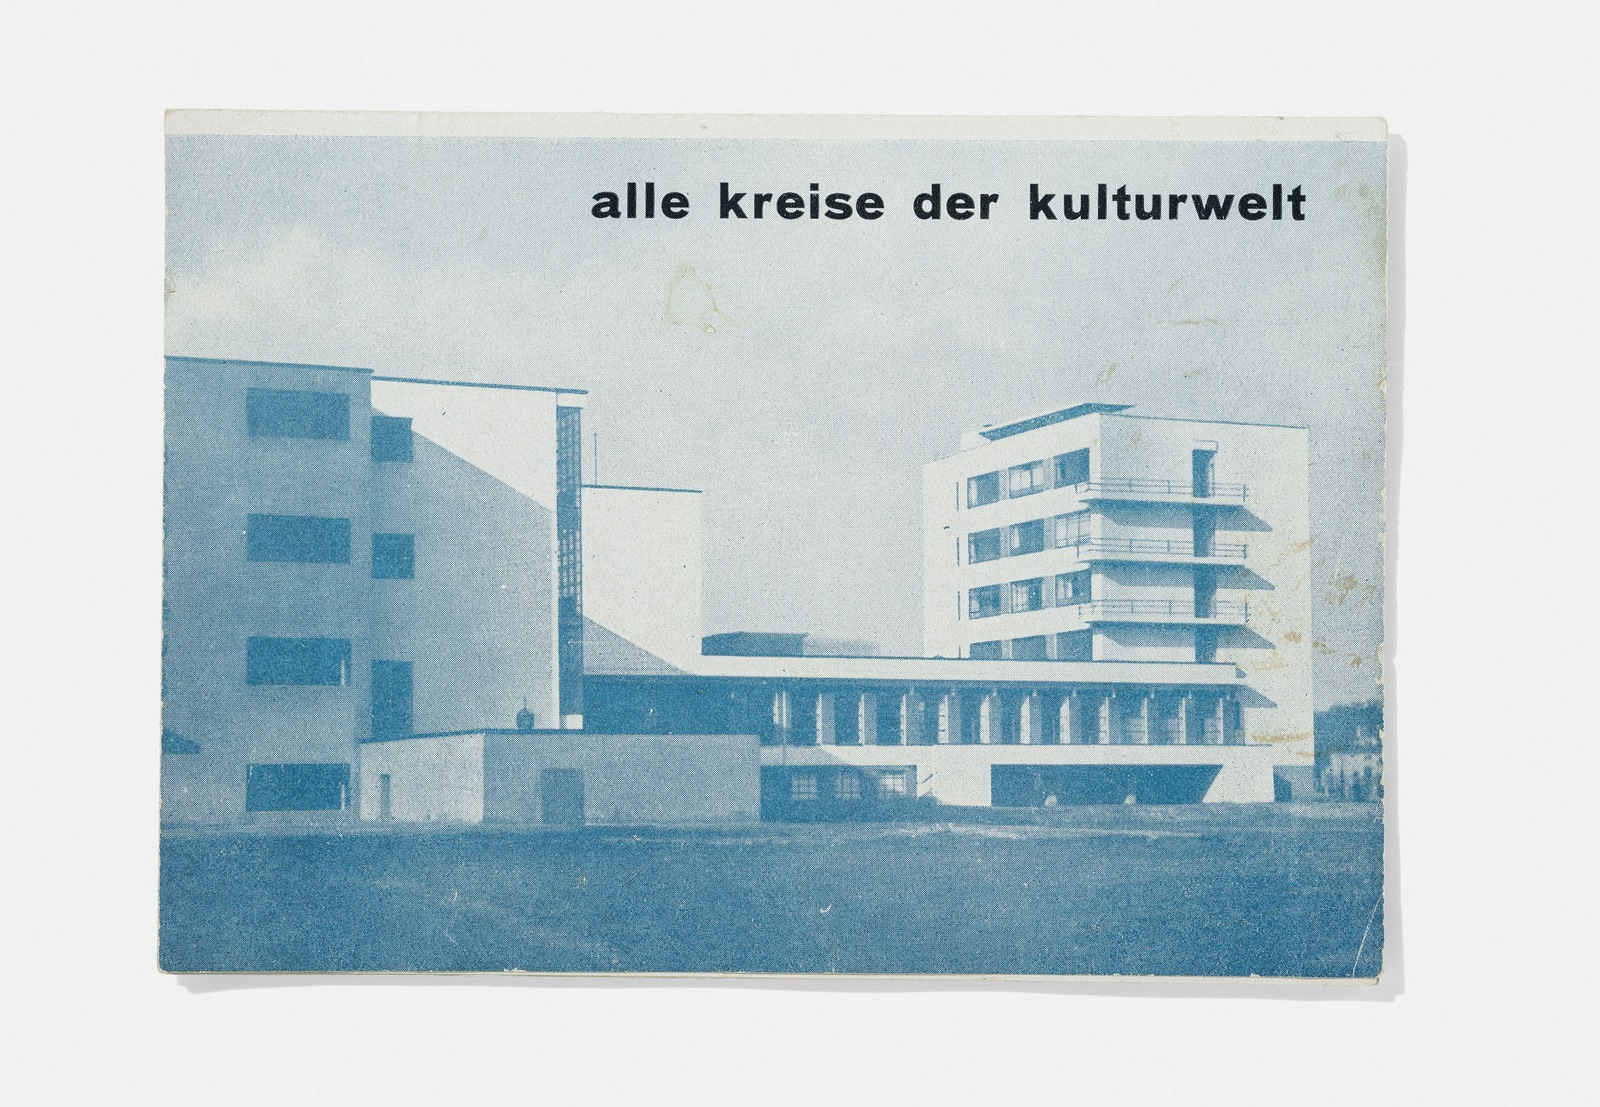 "Bauhaus Dessau, folleto promocional de la revista ""bauhaus, alle kreise der kulturwelt"" (bauhaus, todos los círculos del mundo cultural""), 1927. Foto: A. Körner (bildhübsche Fotografie) / Gentileza ifa"